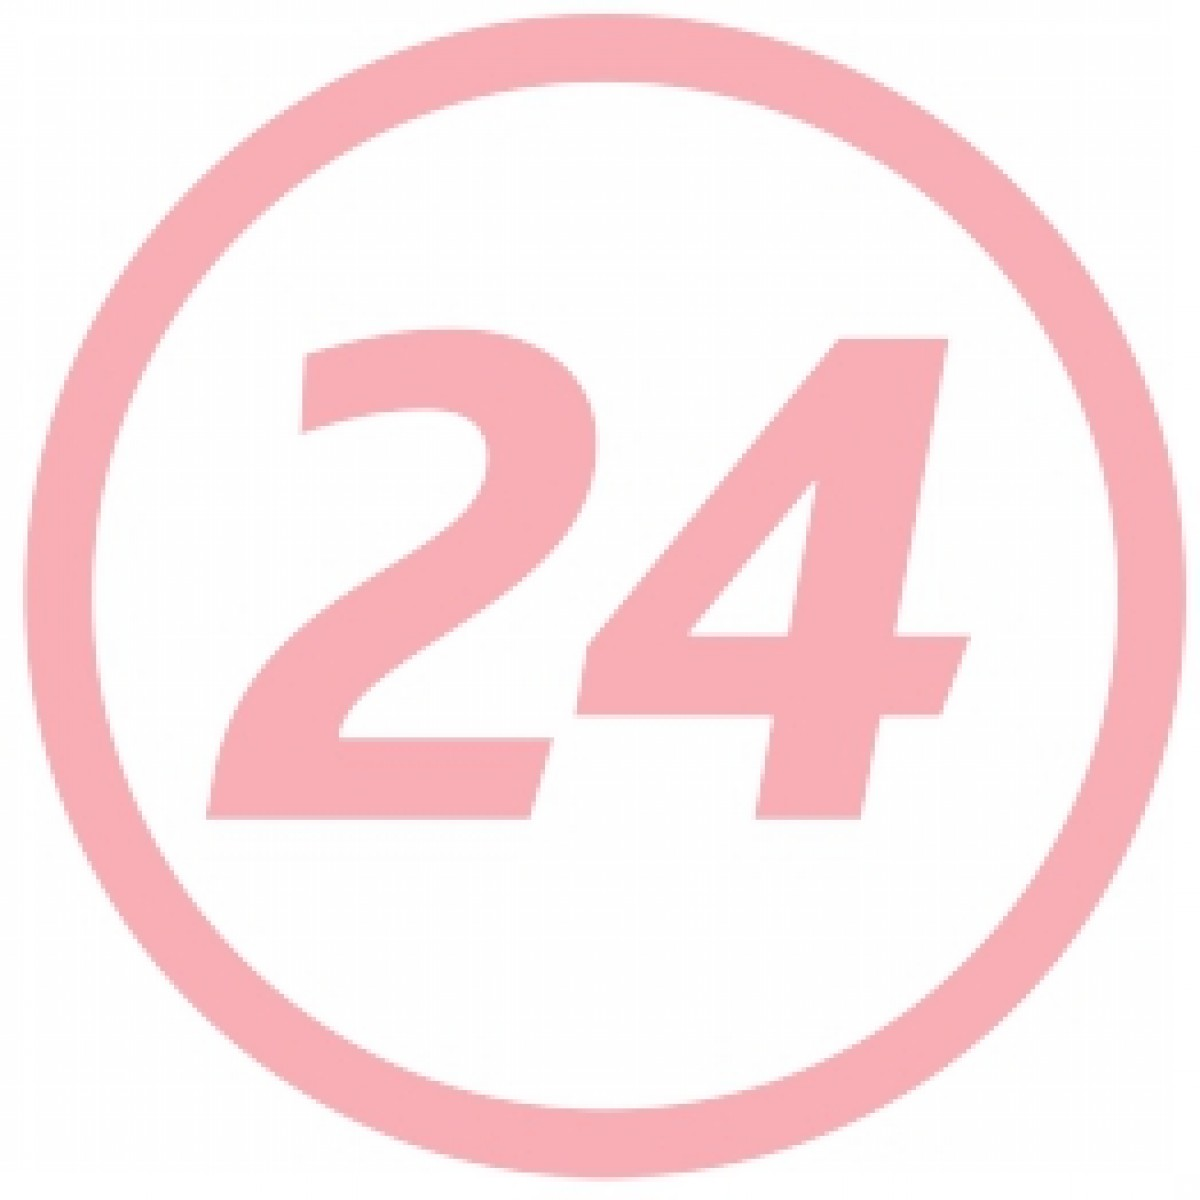 Pudra Minerala Remember Me 6.4 Alva Green, 2,25g